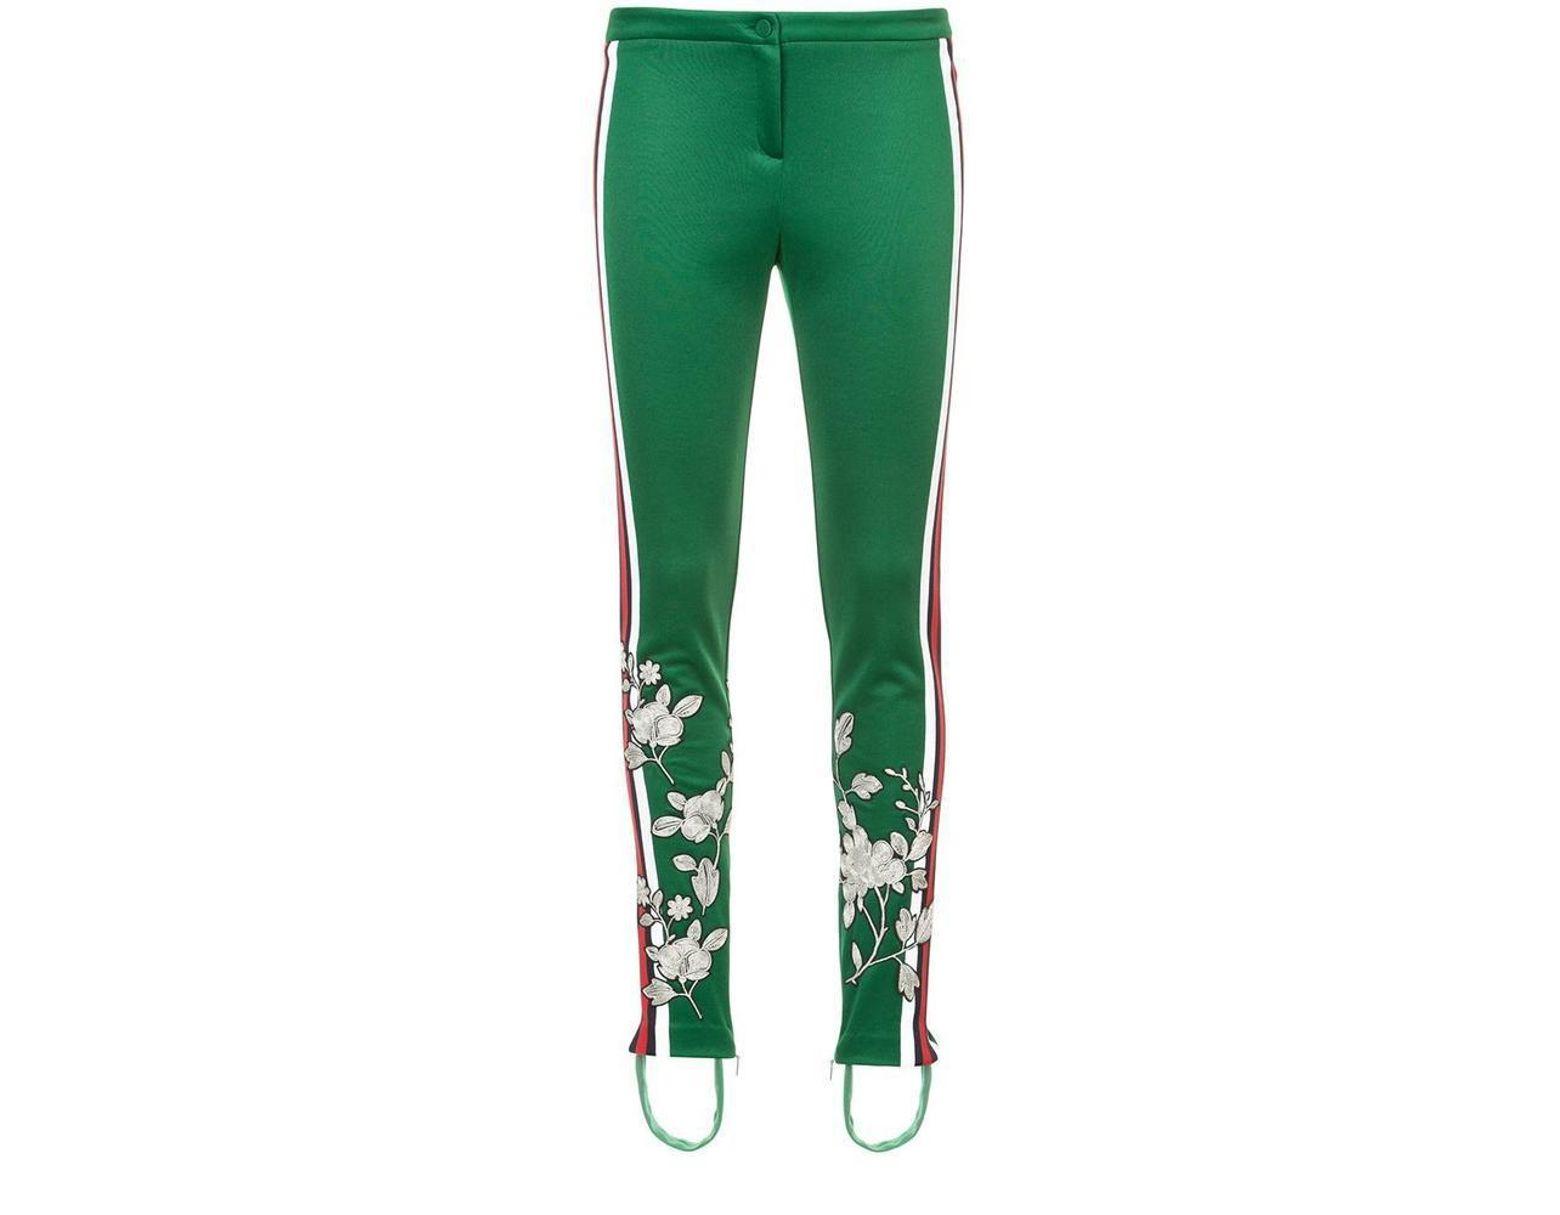 c19187c9 Women's Green Embroidered Jersey Stirrup Leggings